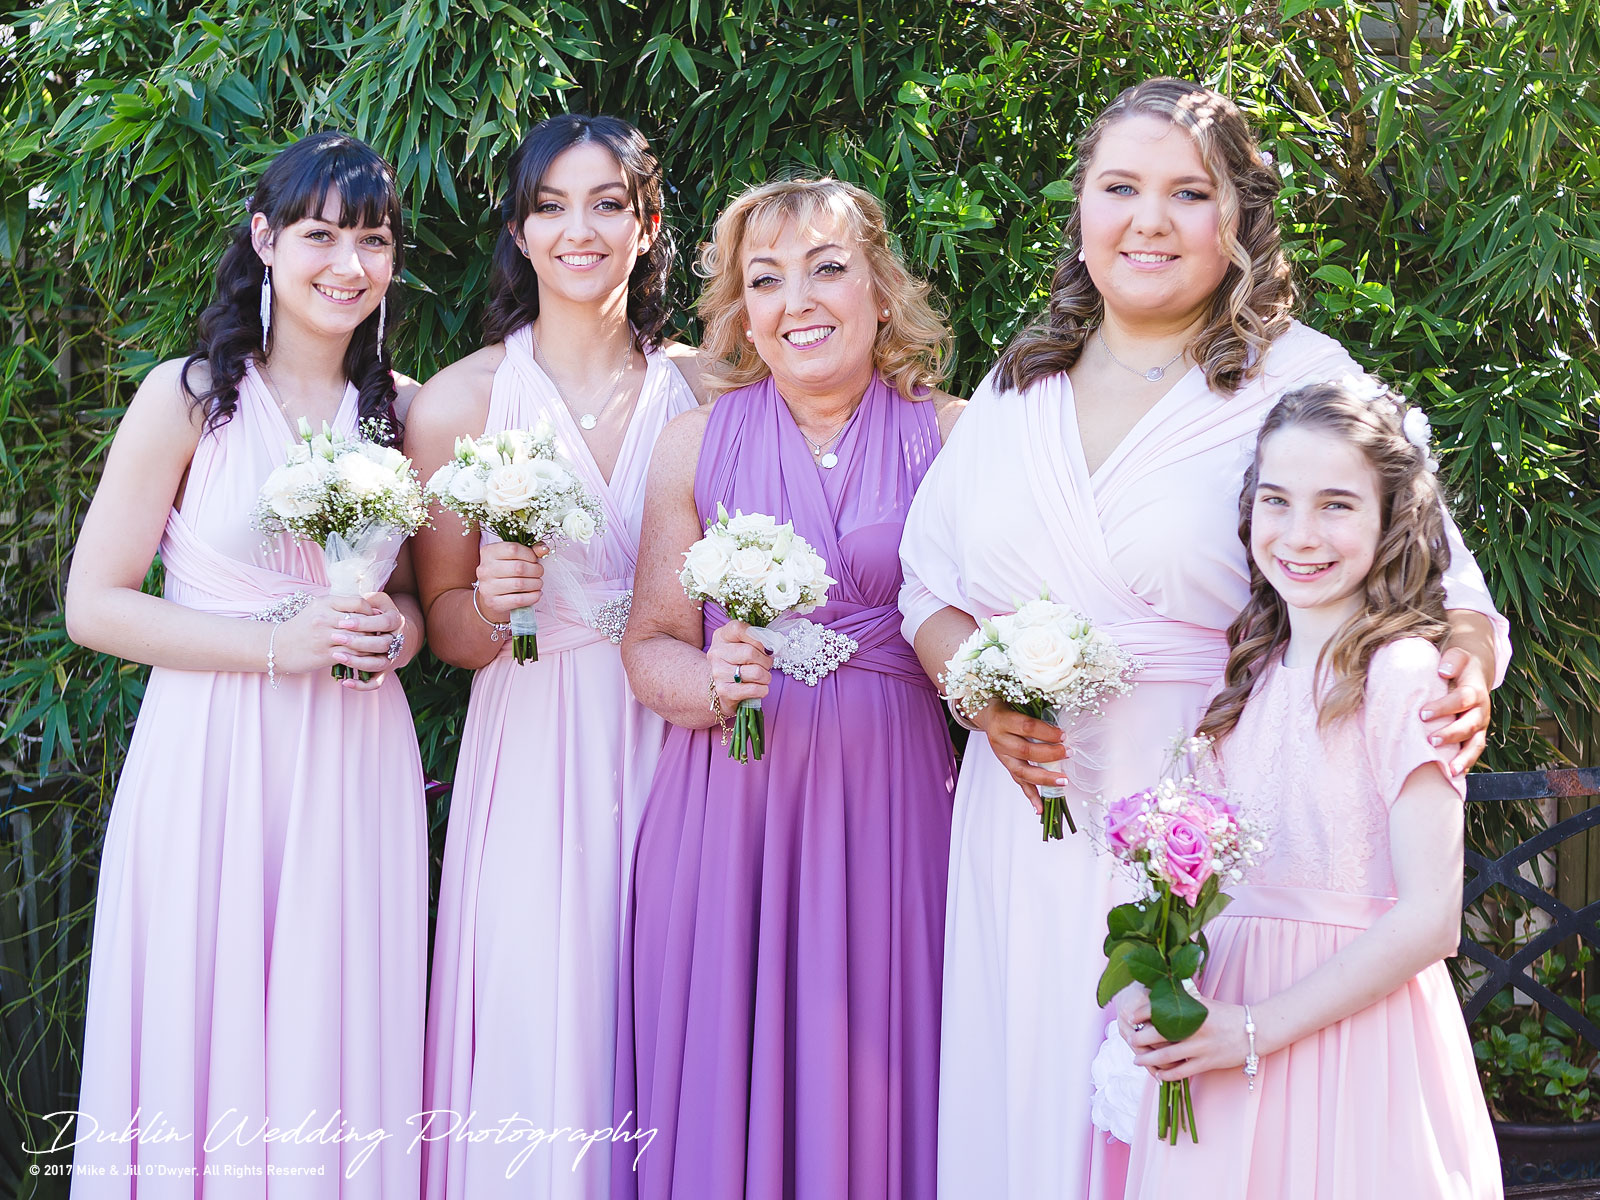 Wedding Photographer in Wicklow Glenview Hotel Bride Prep 02